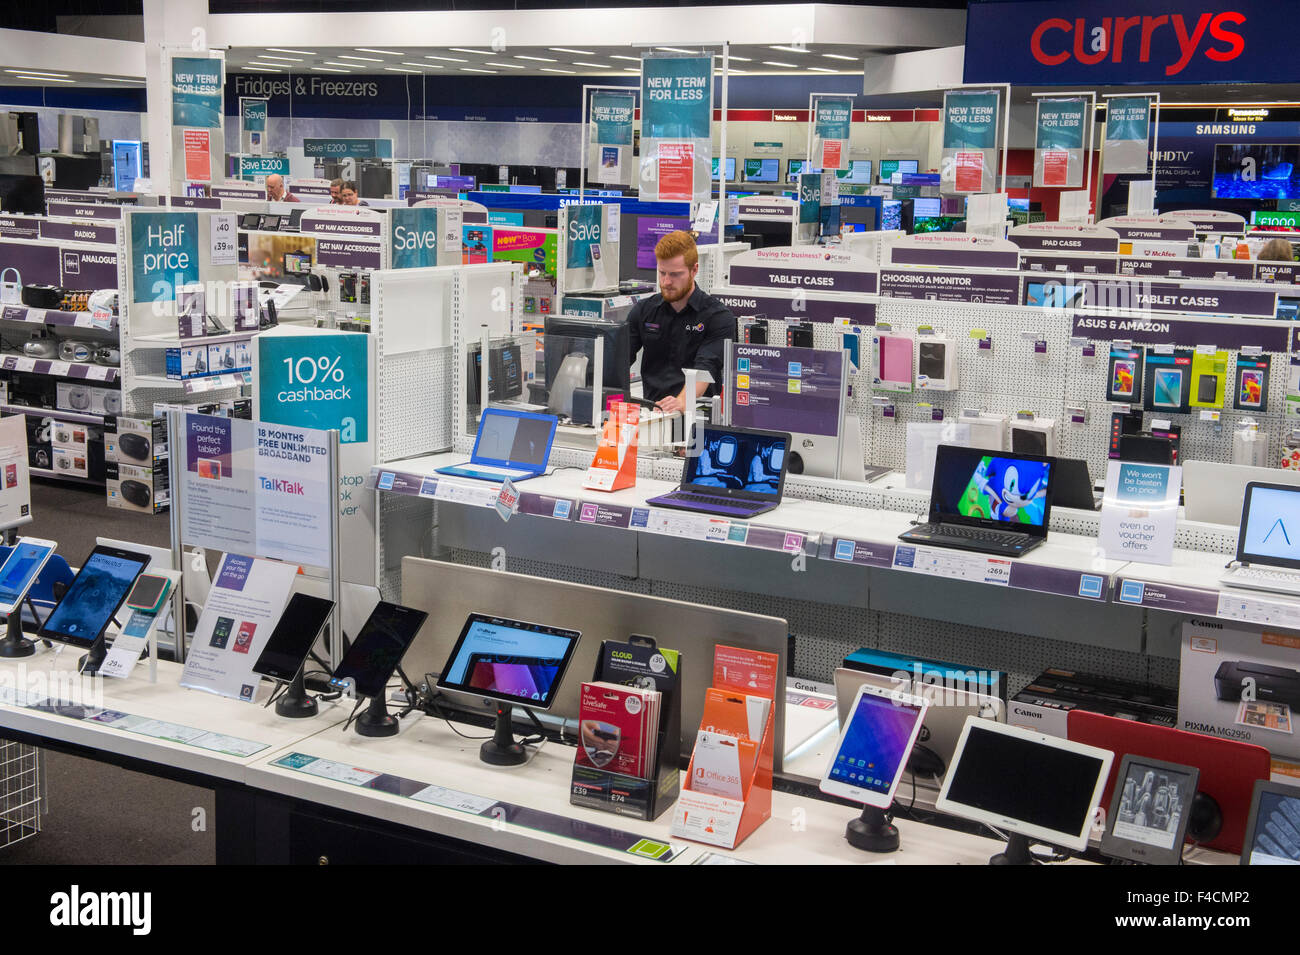 Curry Digital bei Bradford Forster Quadrat Retail Park. Ein British Land PLC-Retail-Immobilien. Stockbild